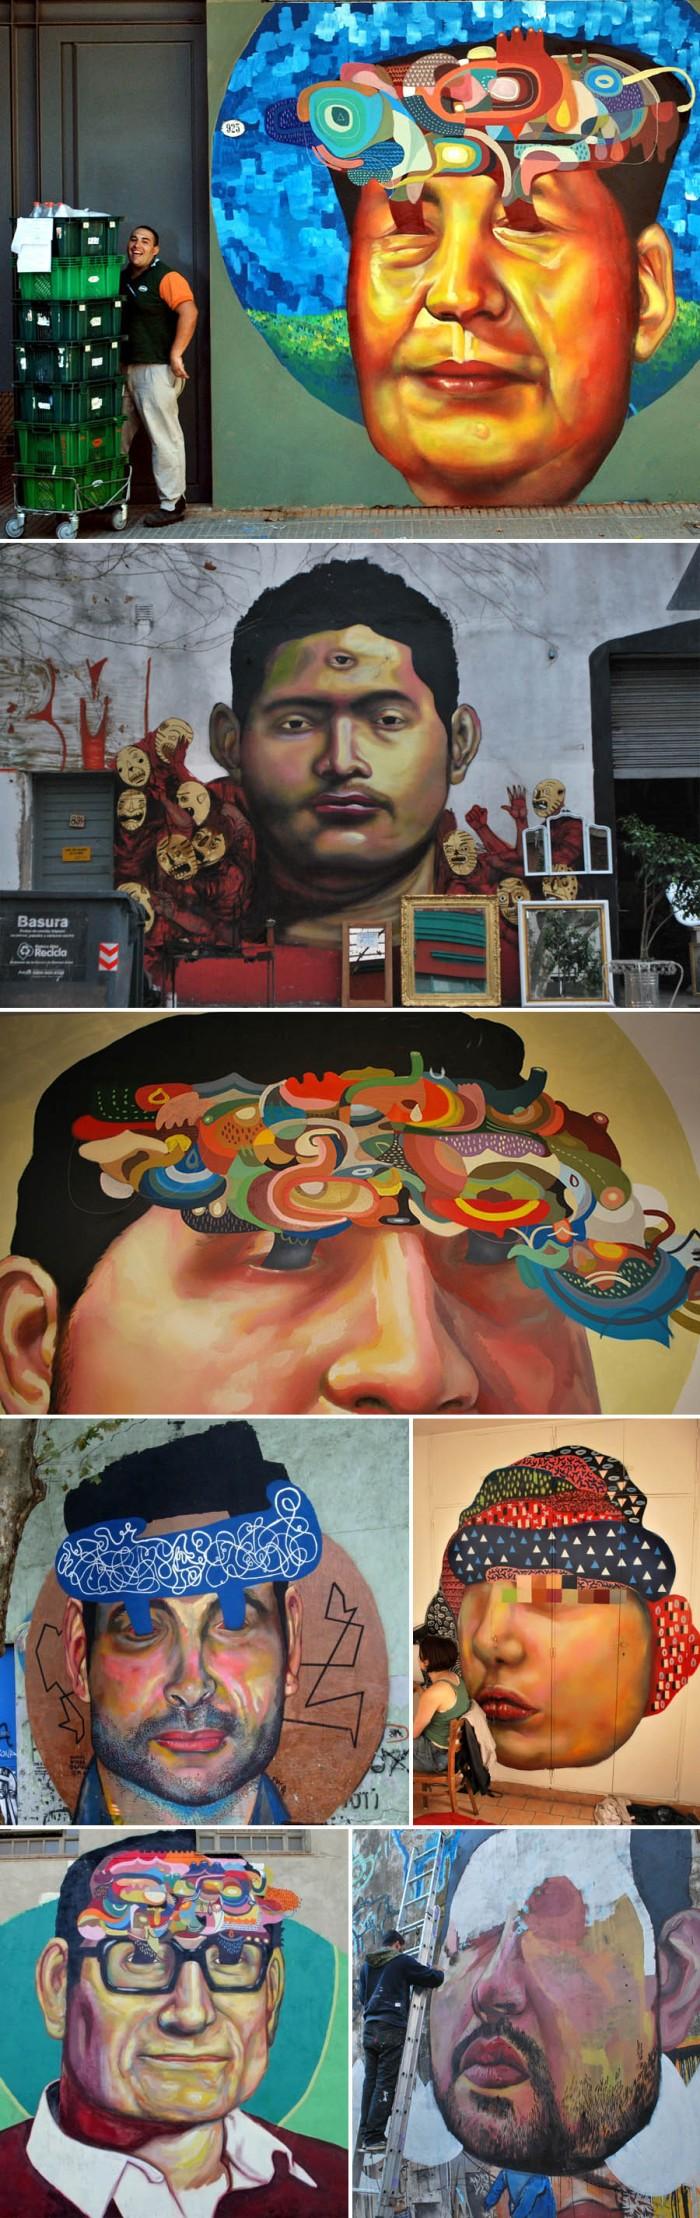 Graffiti, Ever, Siempre, Argentina, murals, portraits, street art